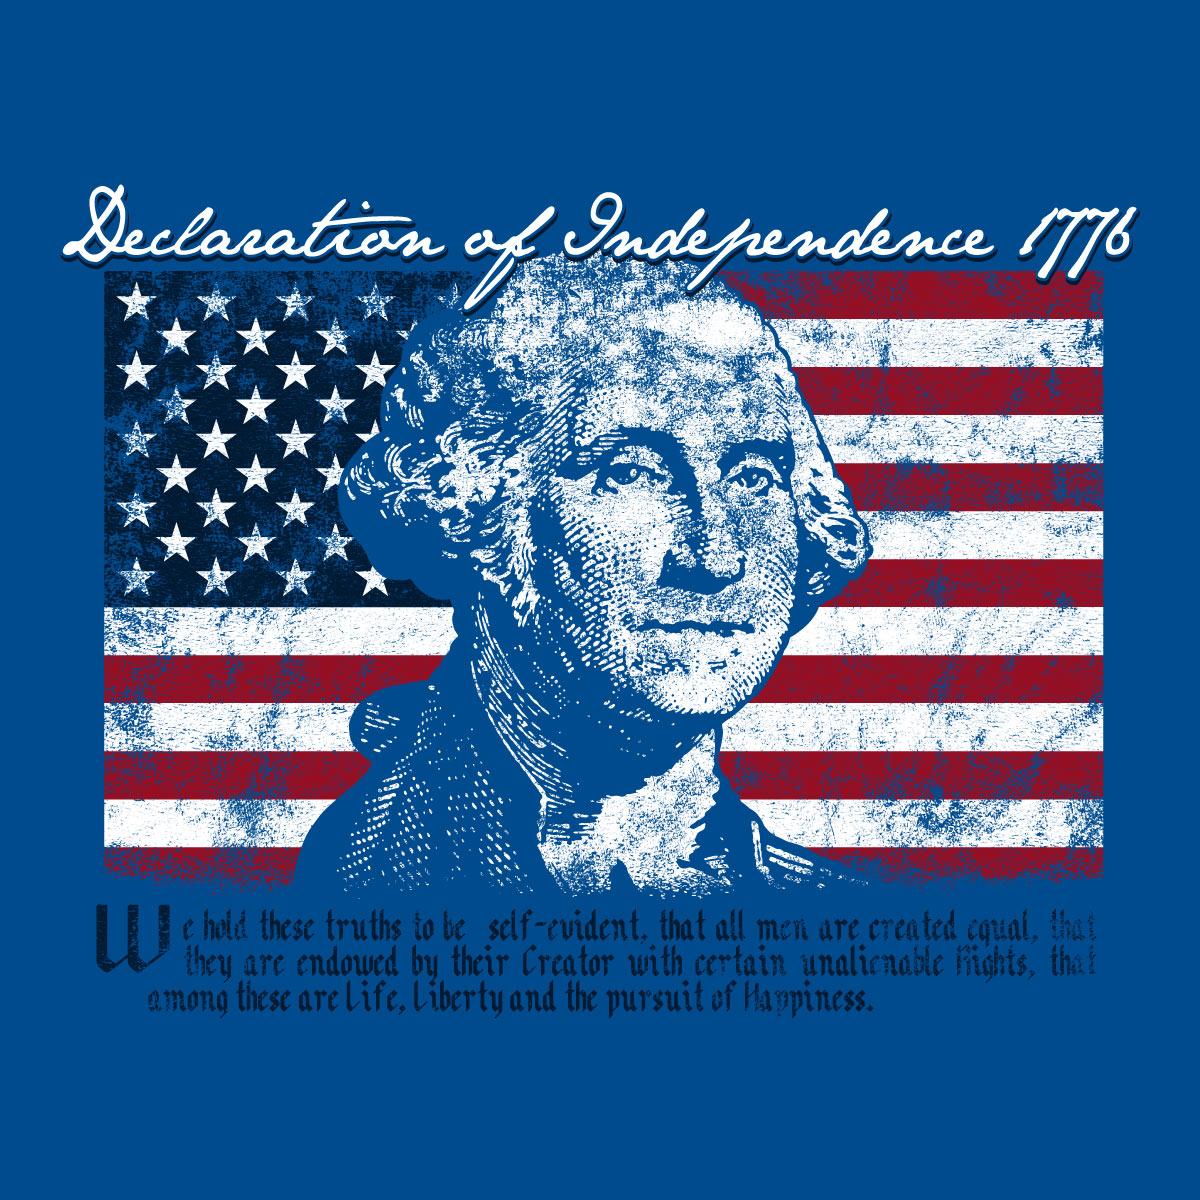 KenYoungCompany_DeclarationOfIndependence.jpg